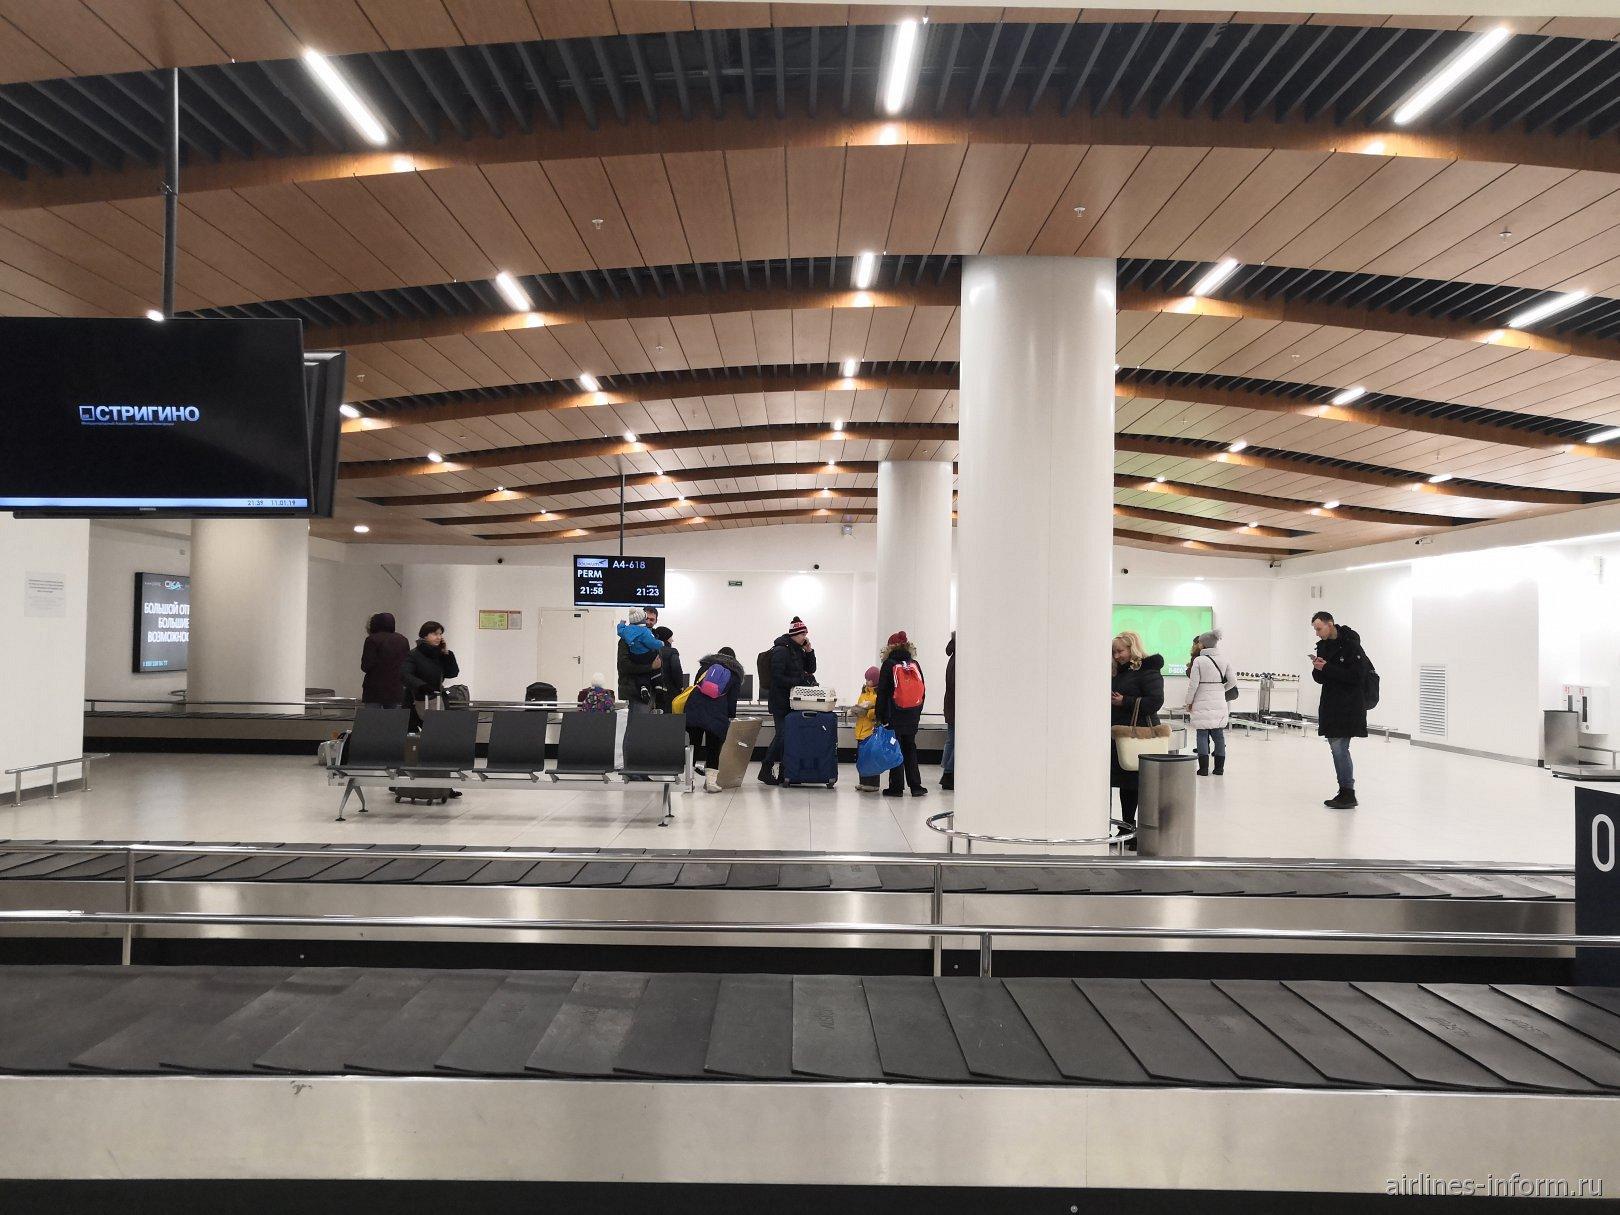 Зал выдачи багажа в аэропорту Нижний Новгород Стригино